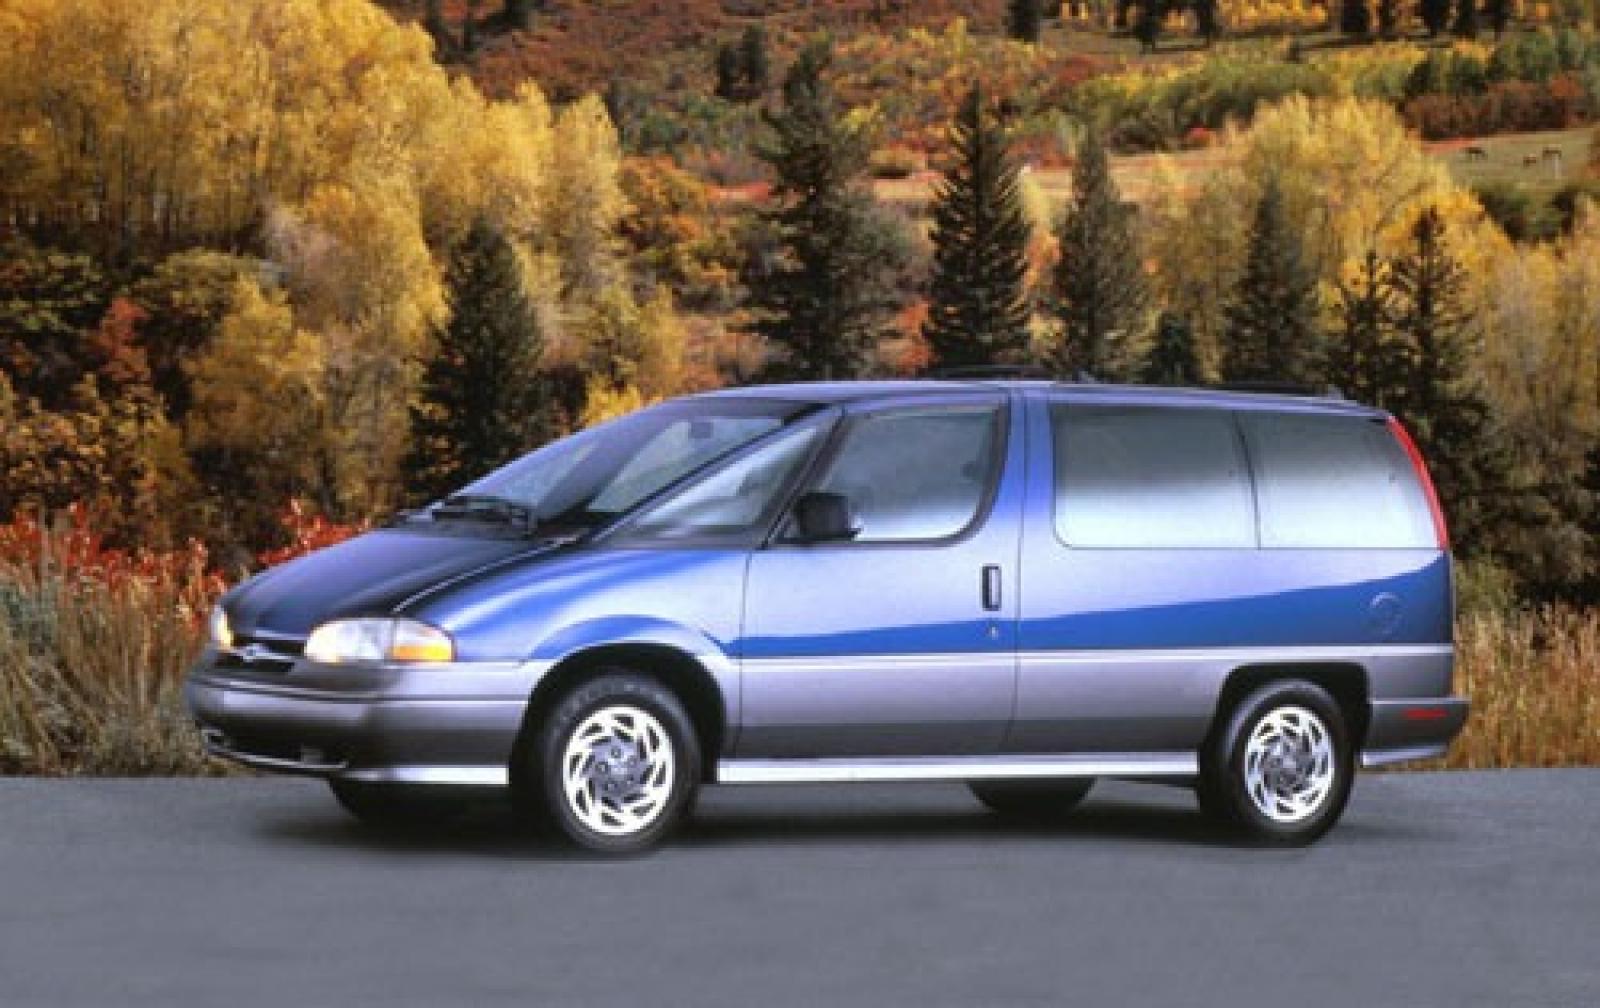 1995 Lumina 3 1 Chevy Engine Diagram Wiring Library 1997 1l Diagrams Chevrolet Minivan 800 1024 1280 1600 Origin